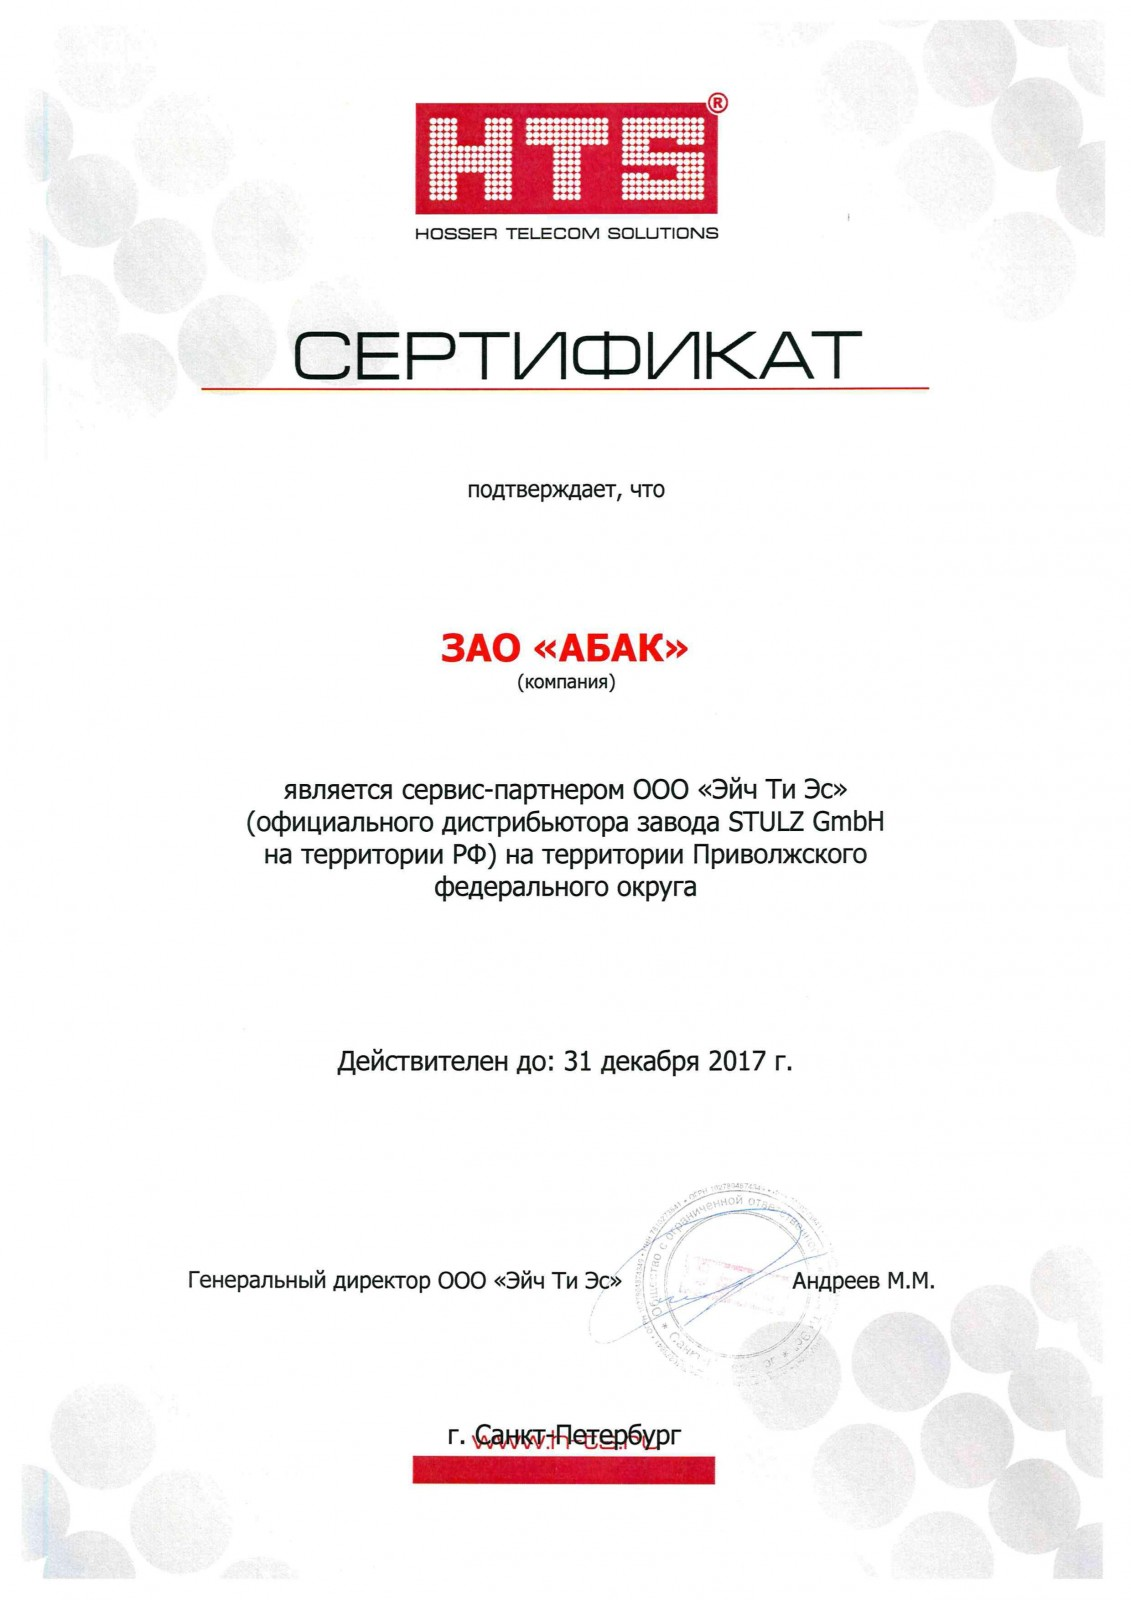 Stulz - HTS партнерство 2017